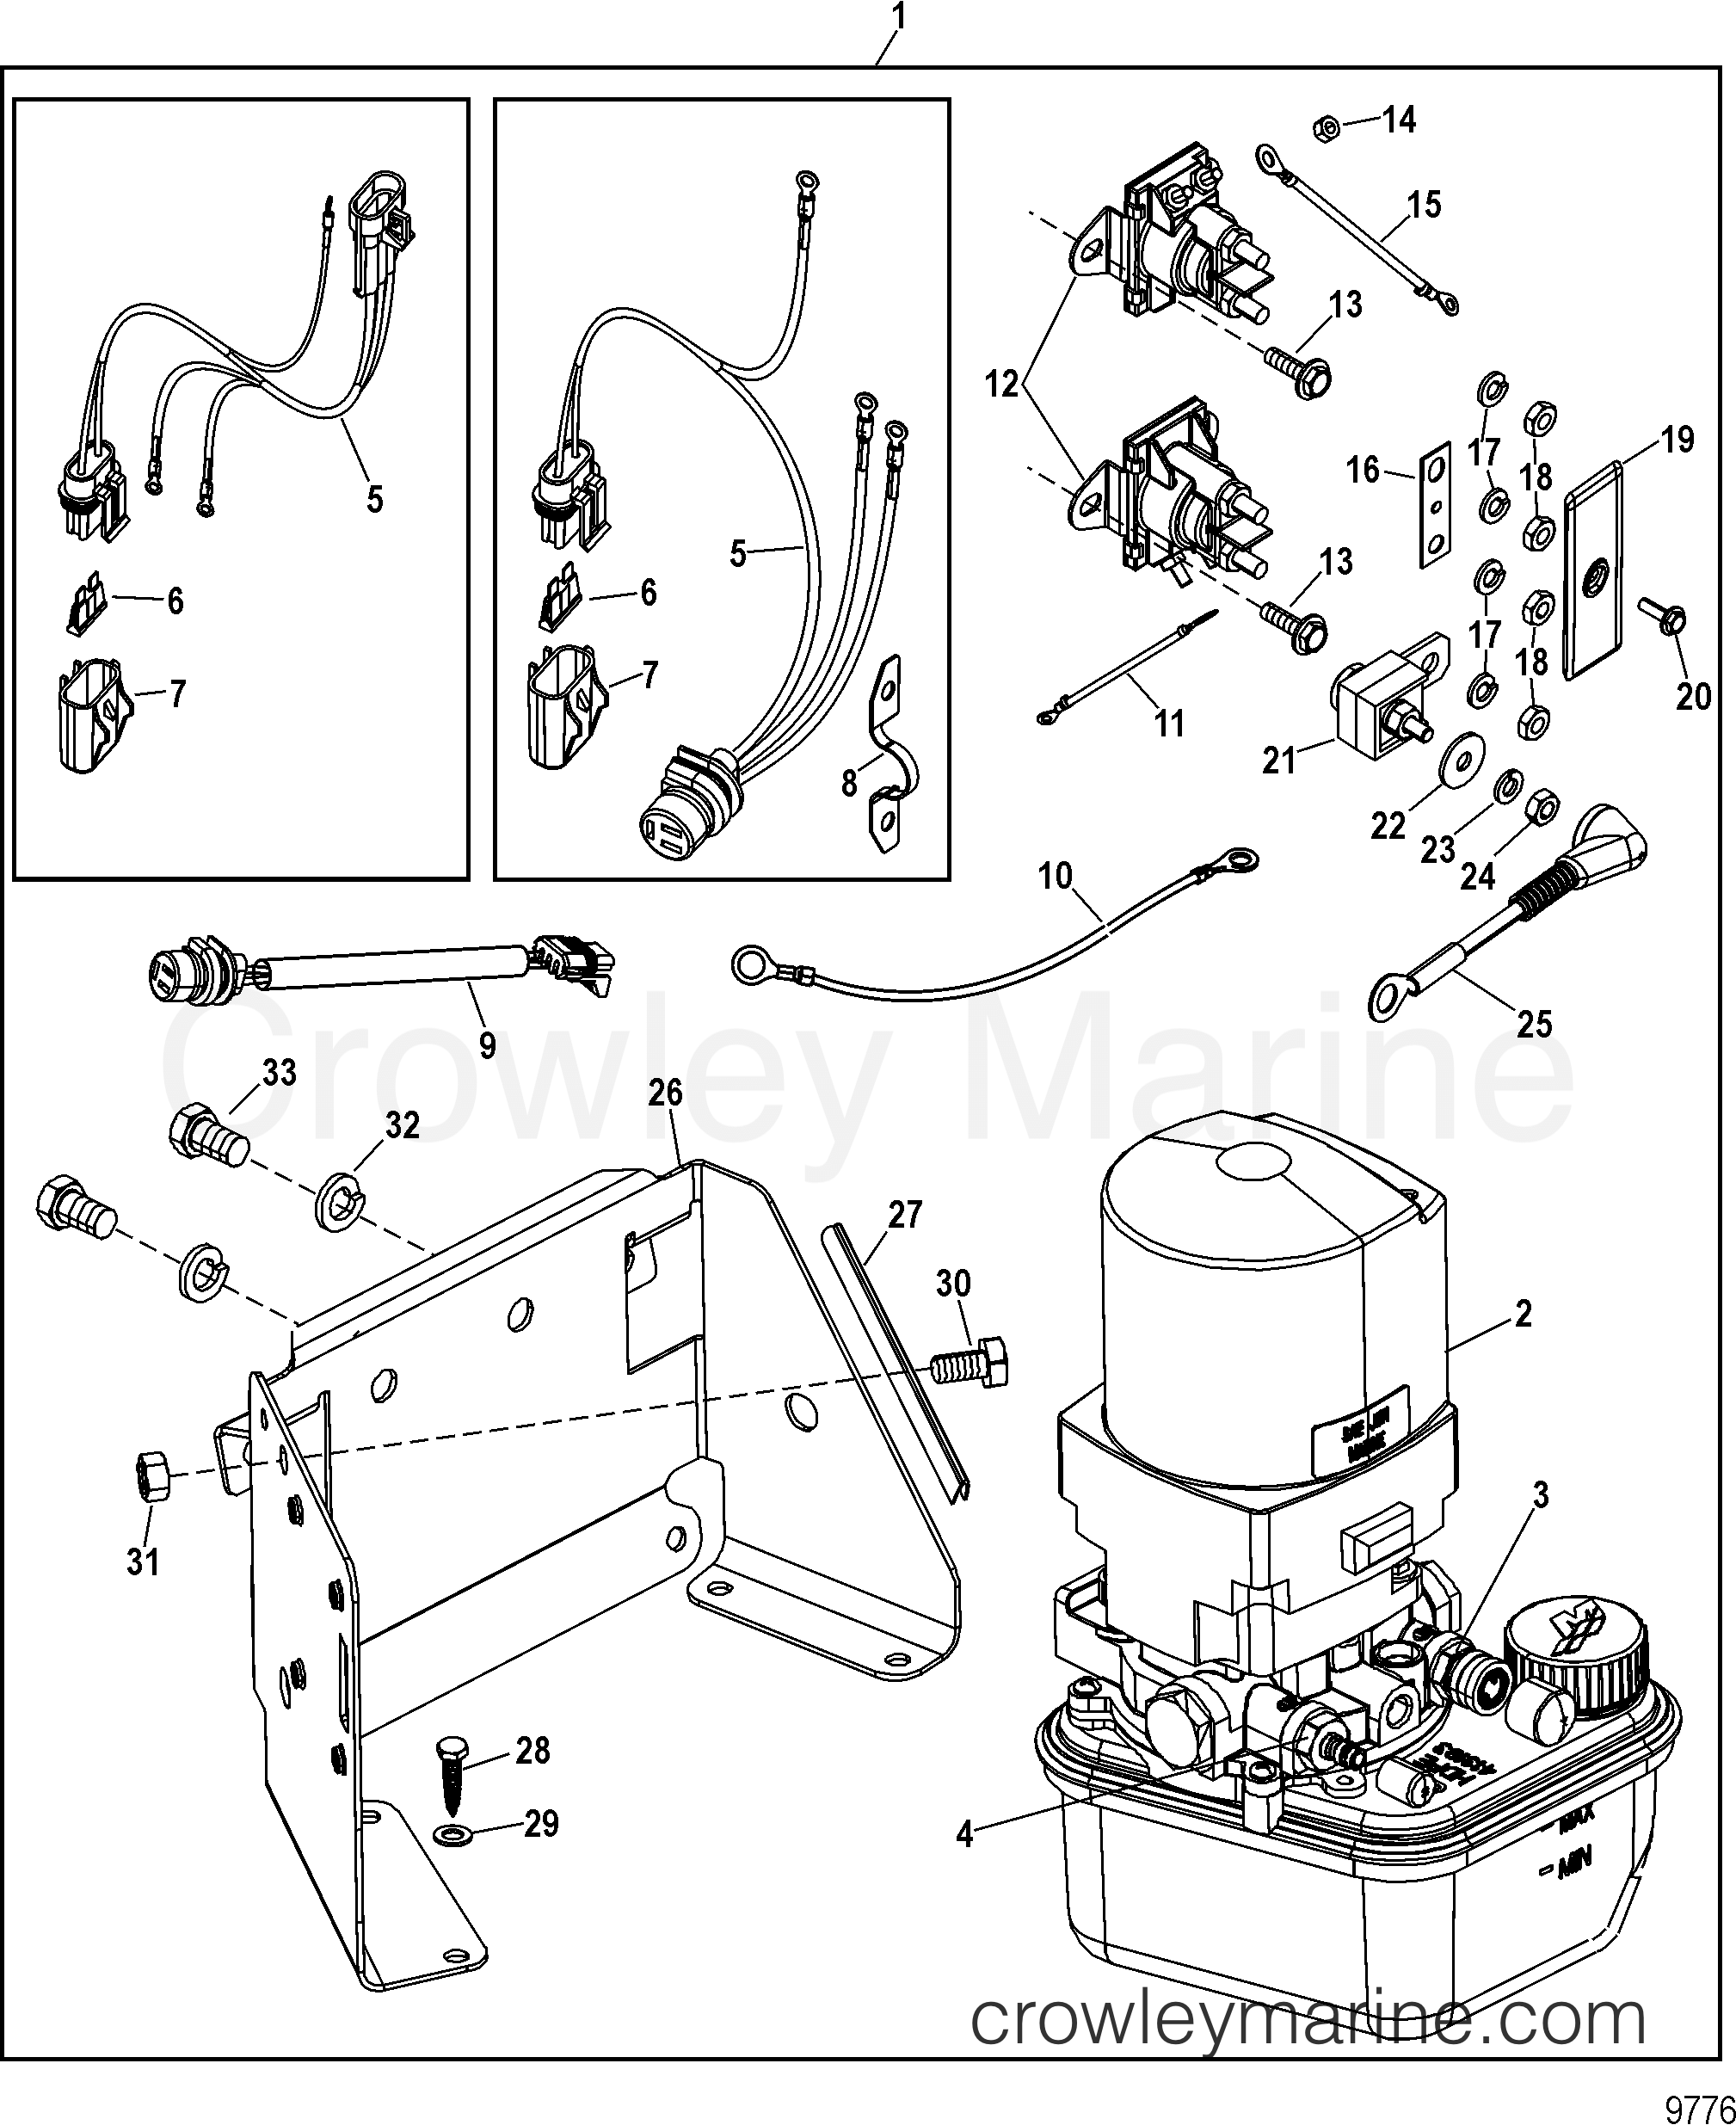 2003 Mercruiser Race Sterndrive 525 EFI [BRAVO] - 4WA2025SH - TRIM PUMP  ASSEMBLY(